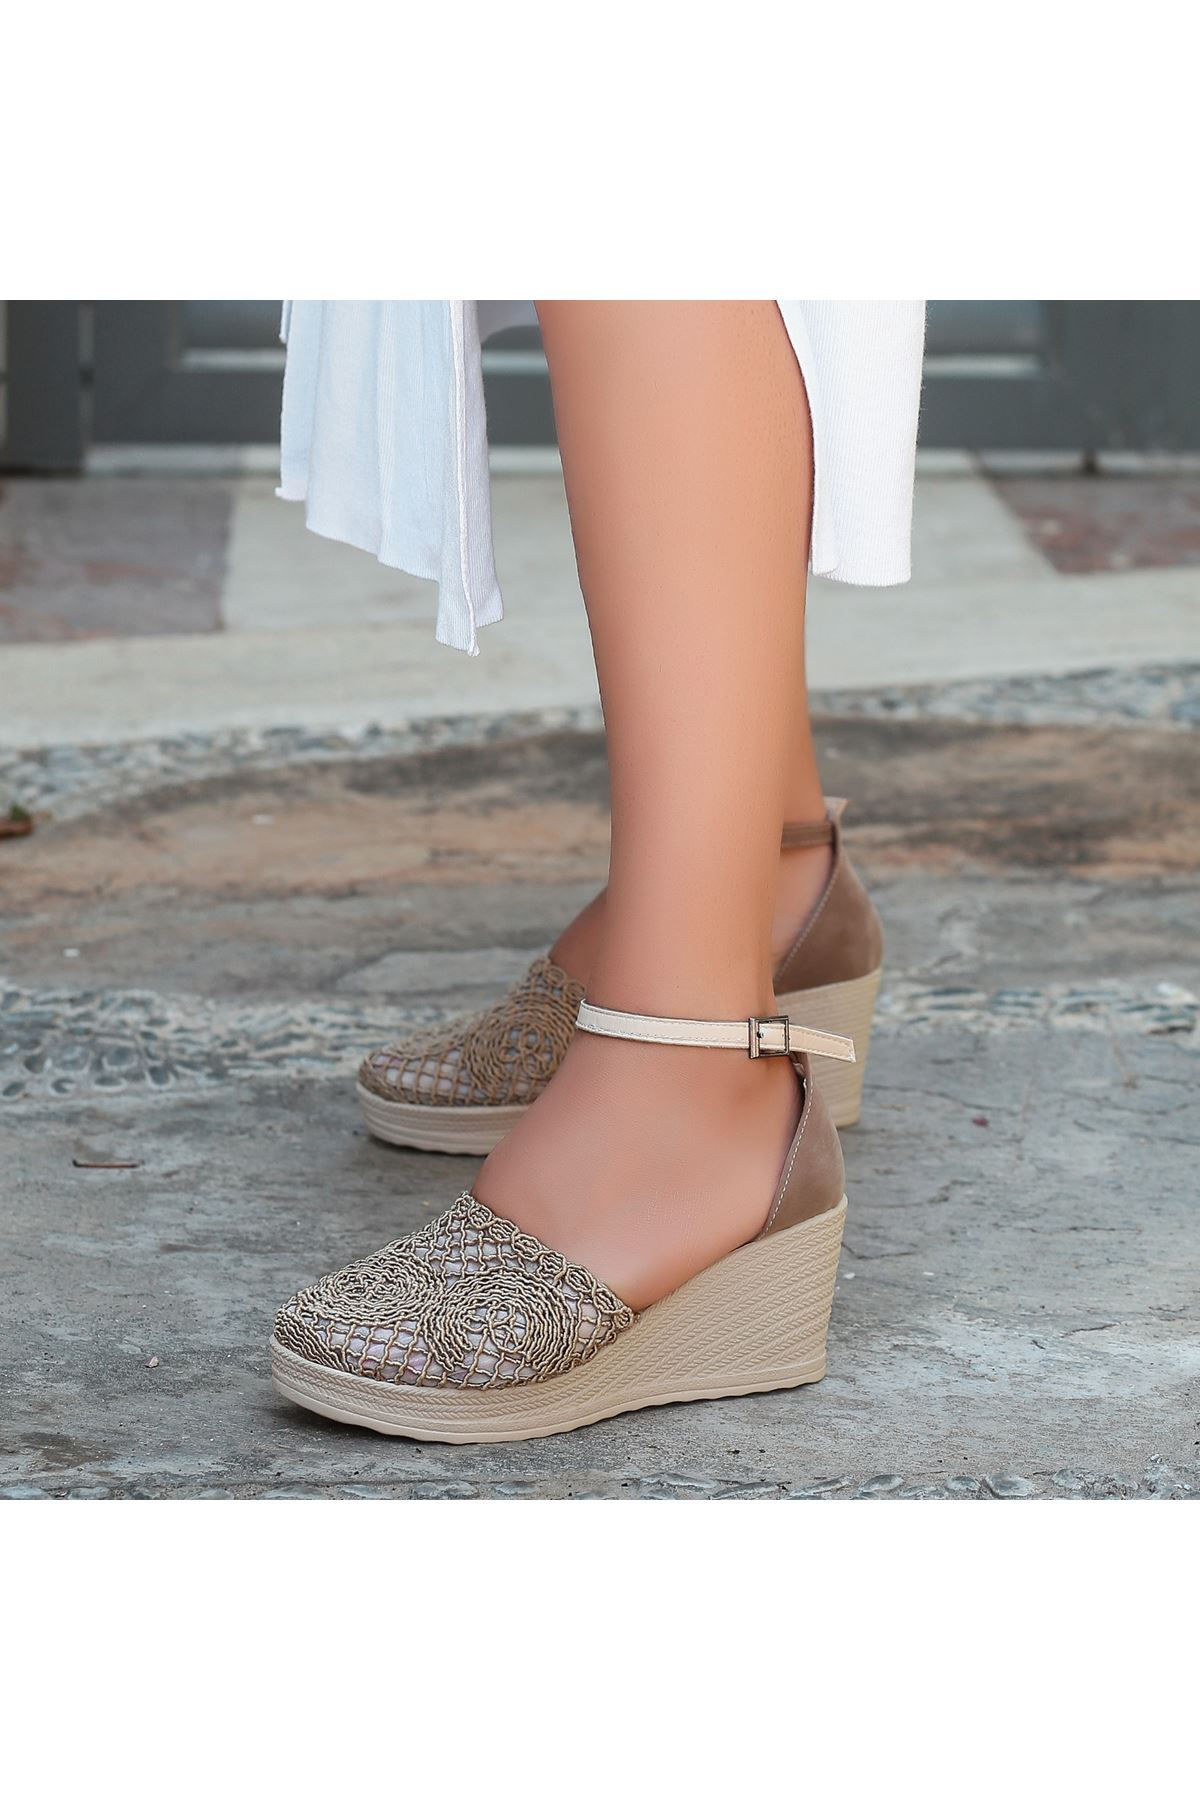 Jioni Vizon Örgülü Dolgu Topuk Sandalet